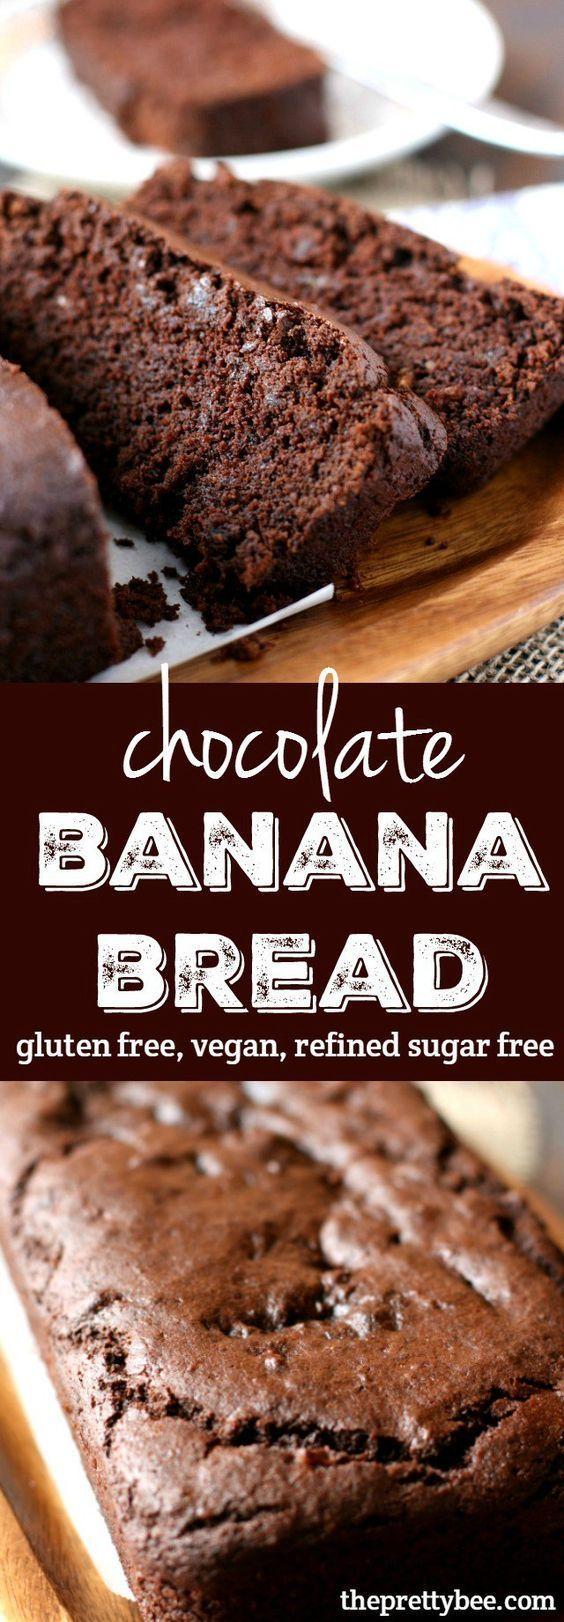 Chocolate Banana Bread (Gluten Free, Vegan, Refined Sugar Free).                                                                                                                                                                                 More